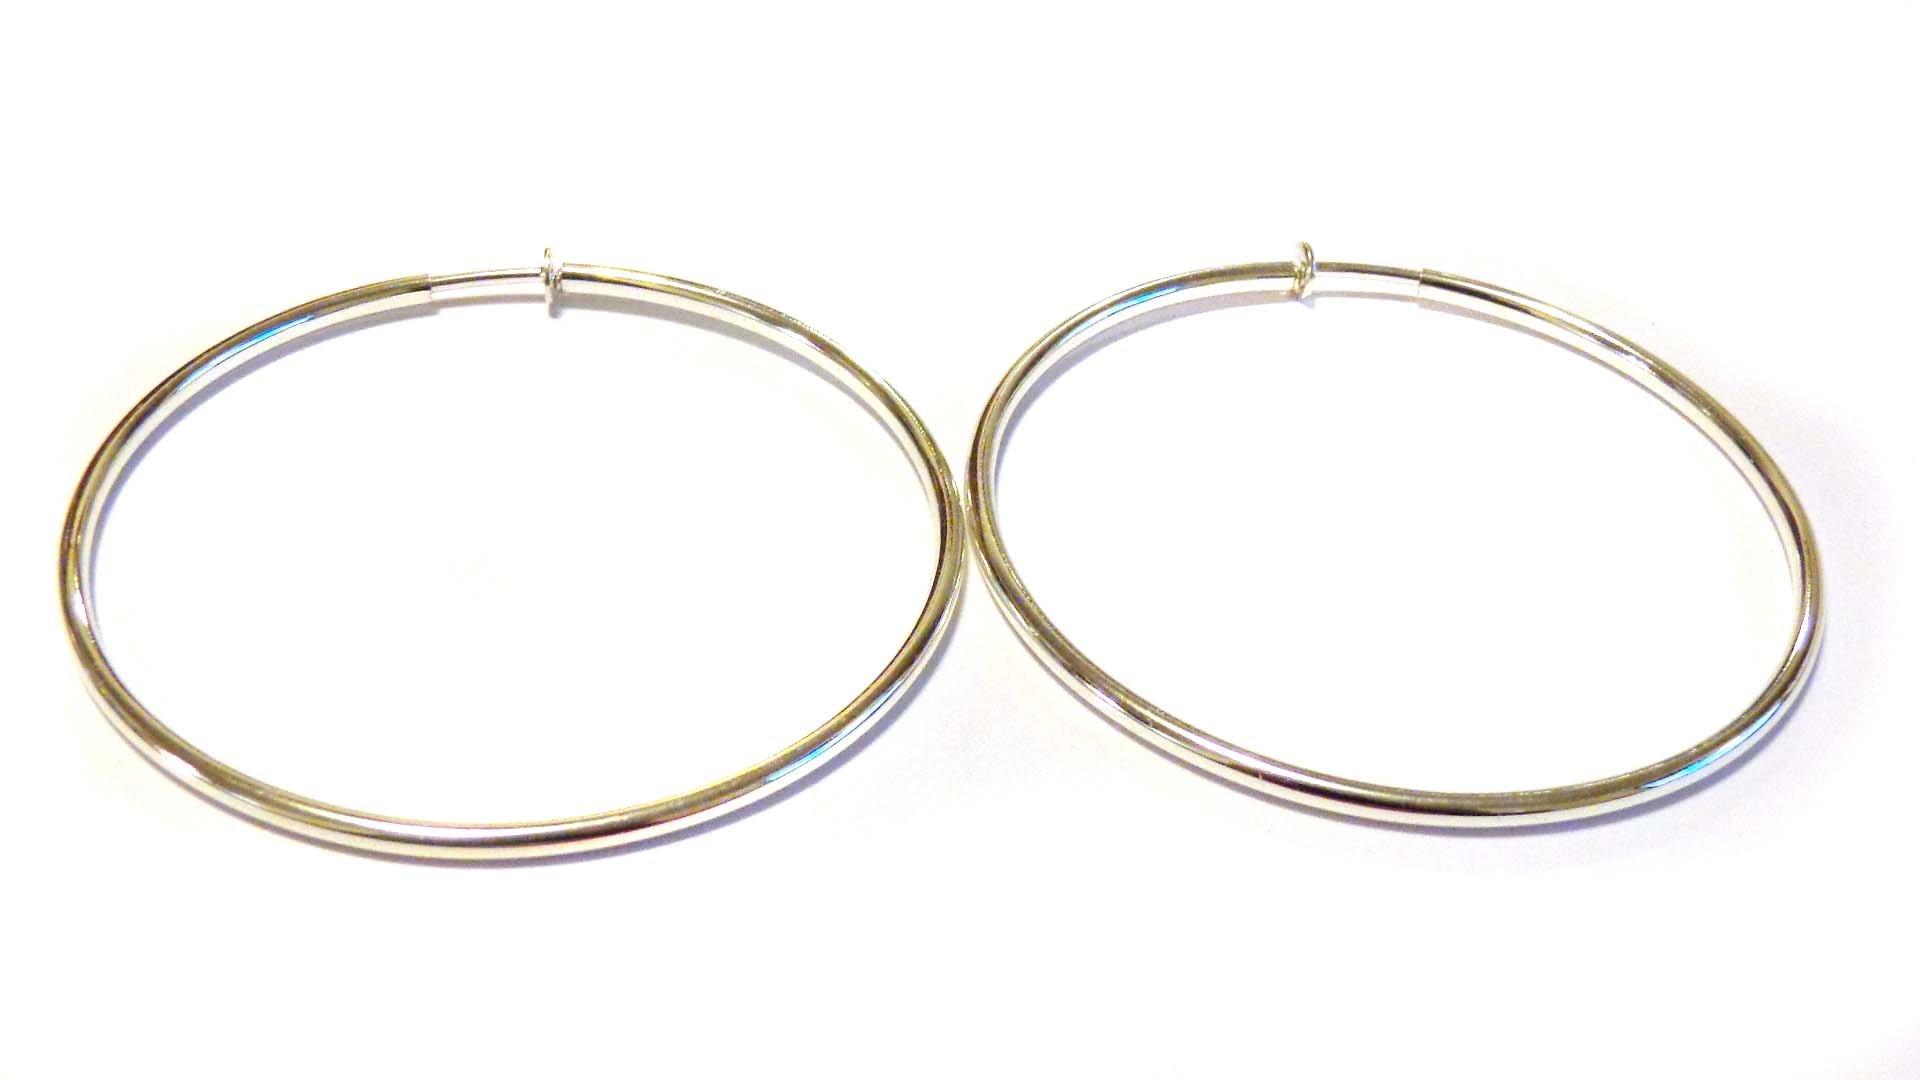 Clip-on Earrings Clip Hoop Earrings Gold or Silver Plated Hypoallergenic Hoop Clip Earrings 3 INCH (silver)